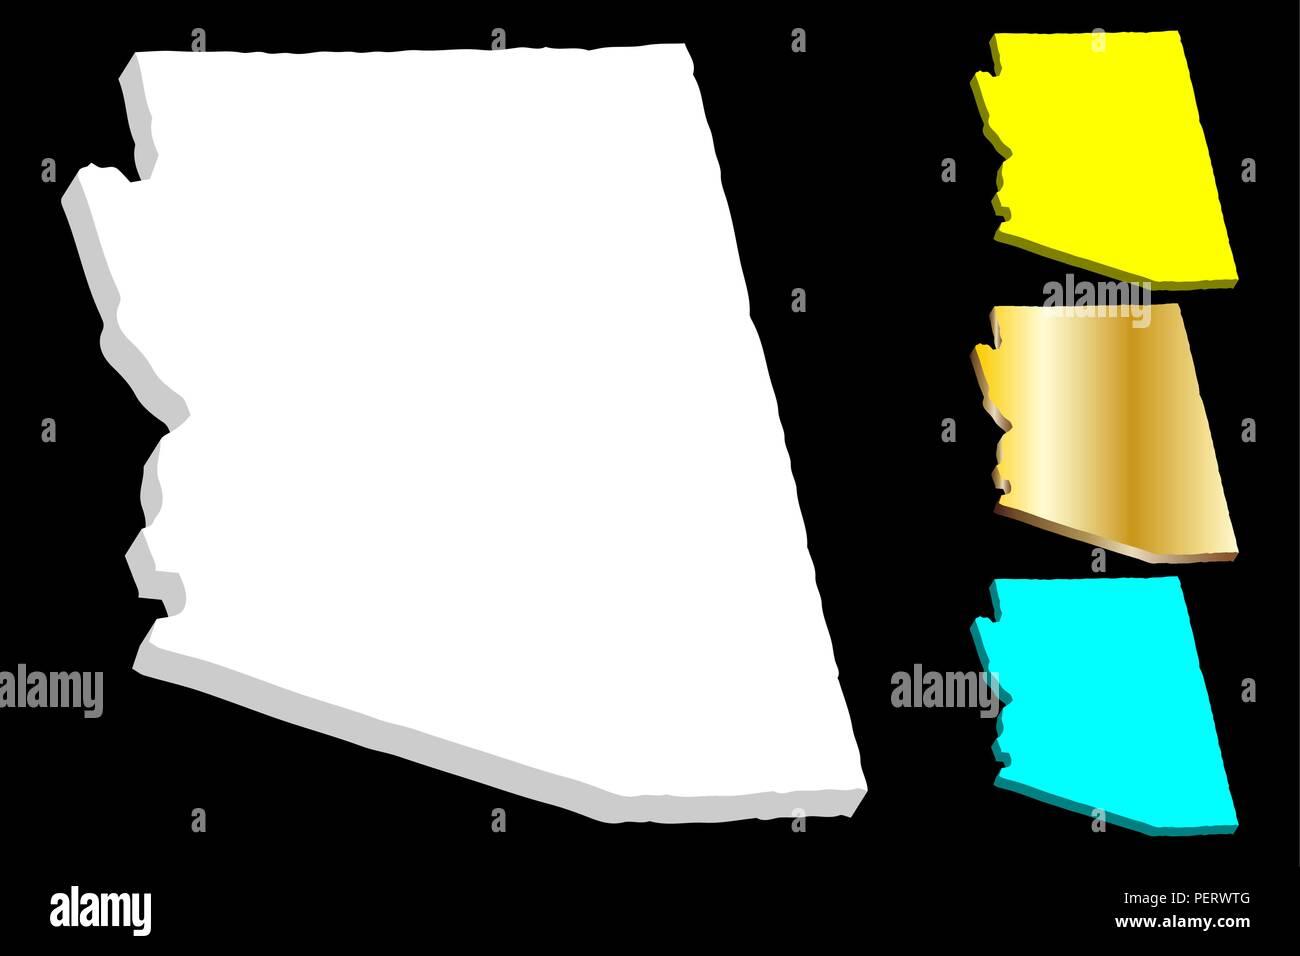 3d Map Of Arizona.3d Map Of Arizona United States Of America White Yellow Blue